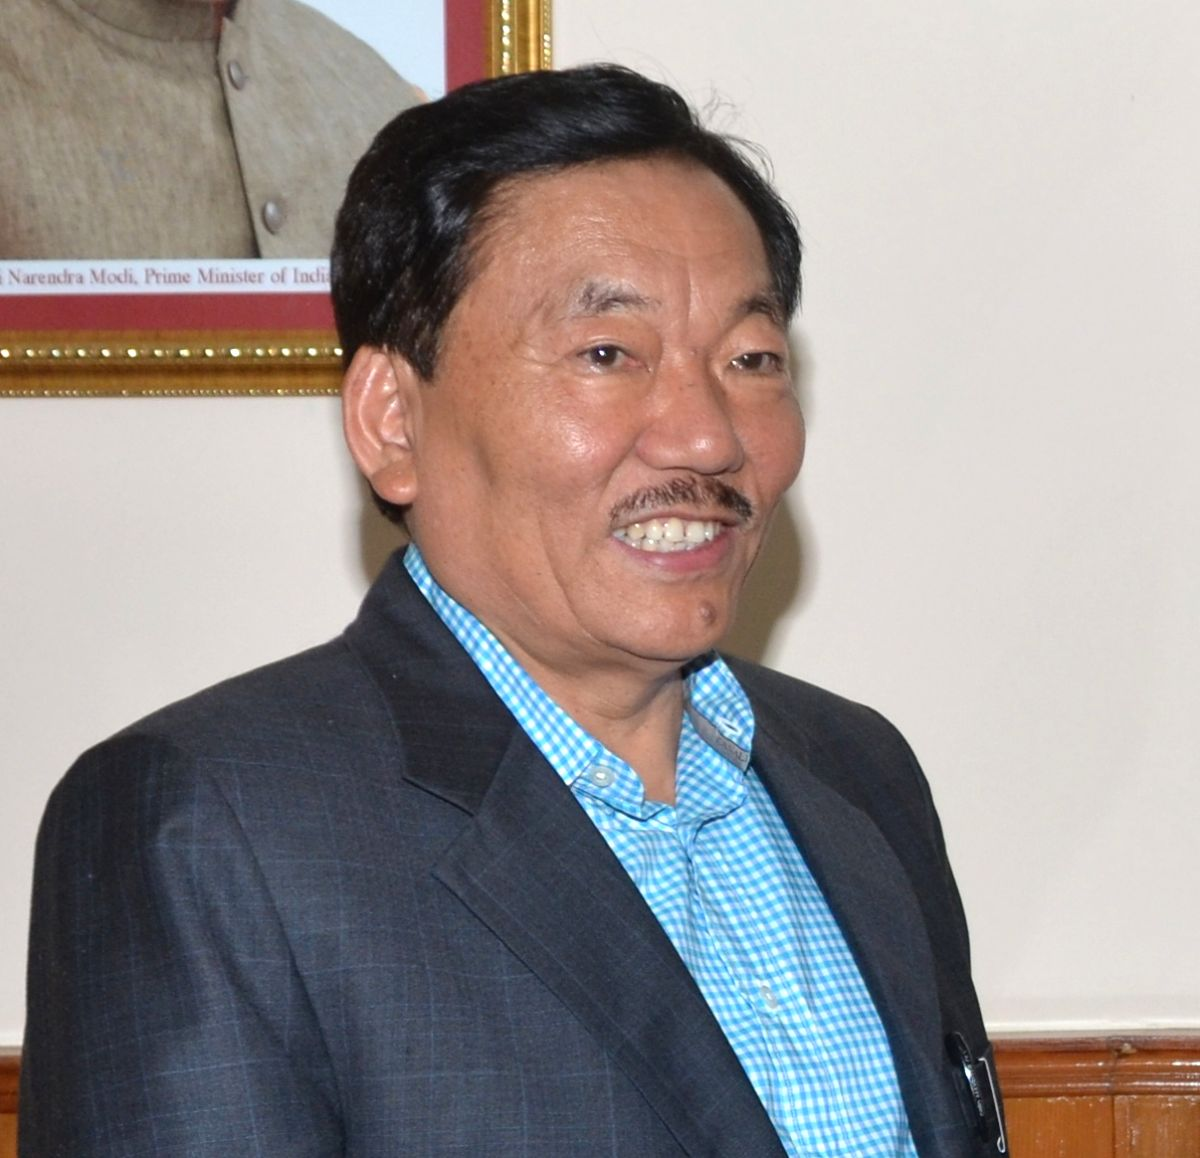 Sikkim Chief Minister Pawan Kumar Chamling. (File Photo: IANS)